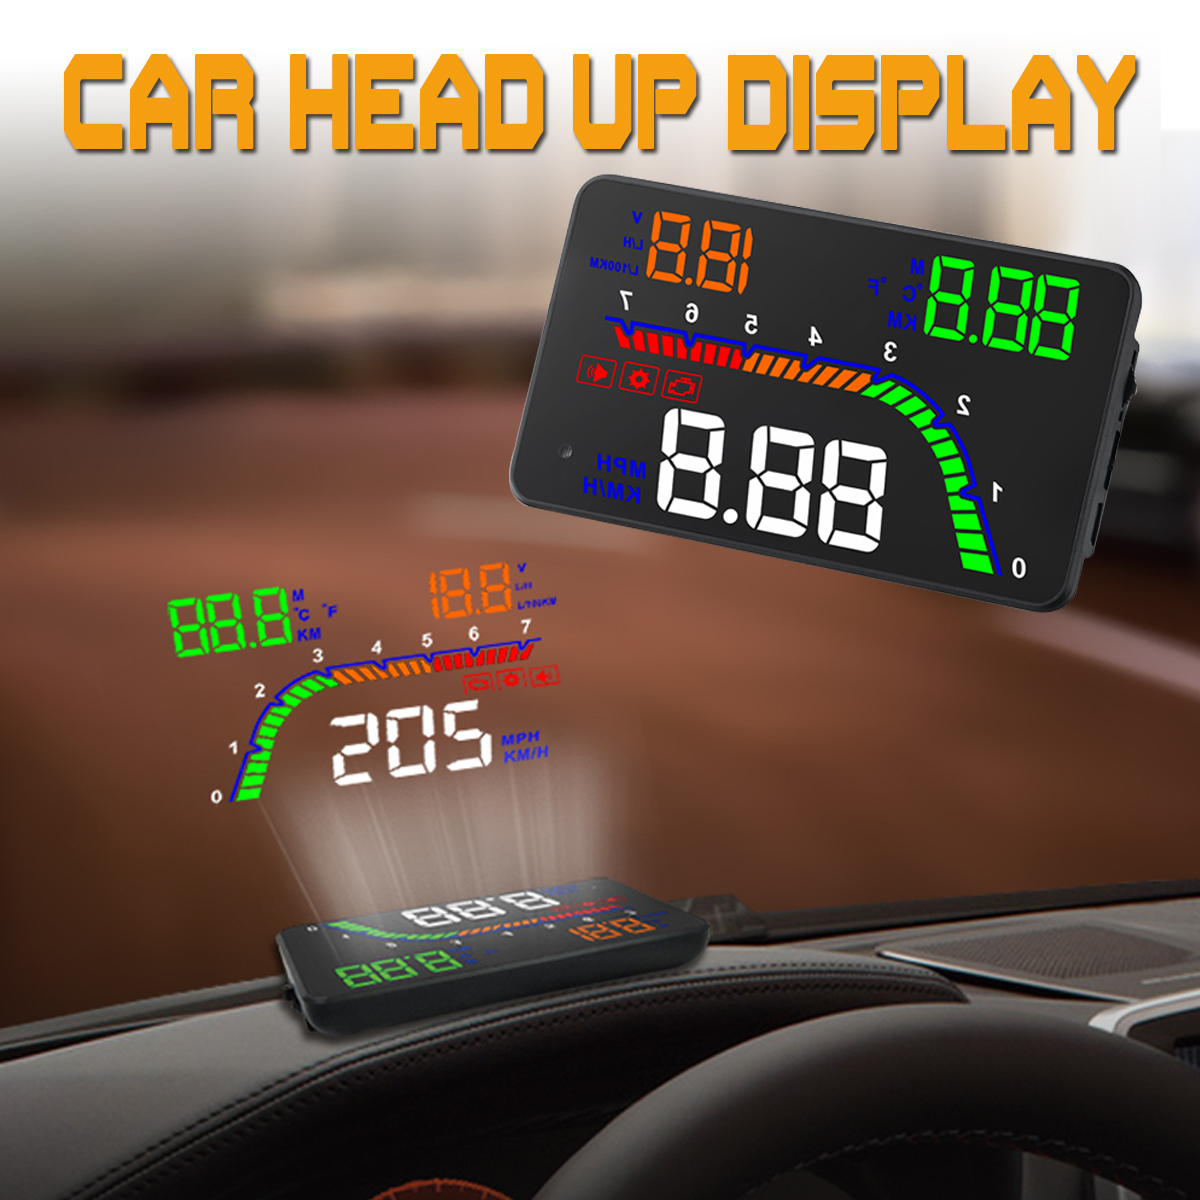 4Inch T100 OBD2 HUD Head Up Display Digital Car Speedometer Windshield Projectort alarm system Electronic display